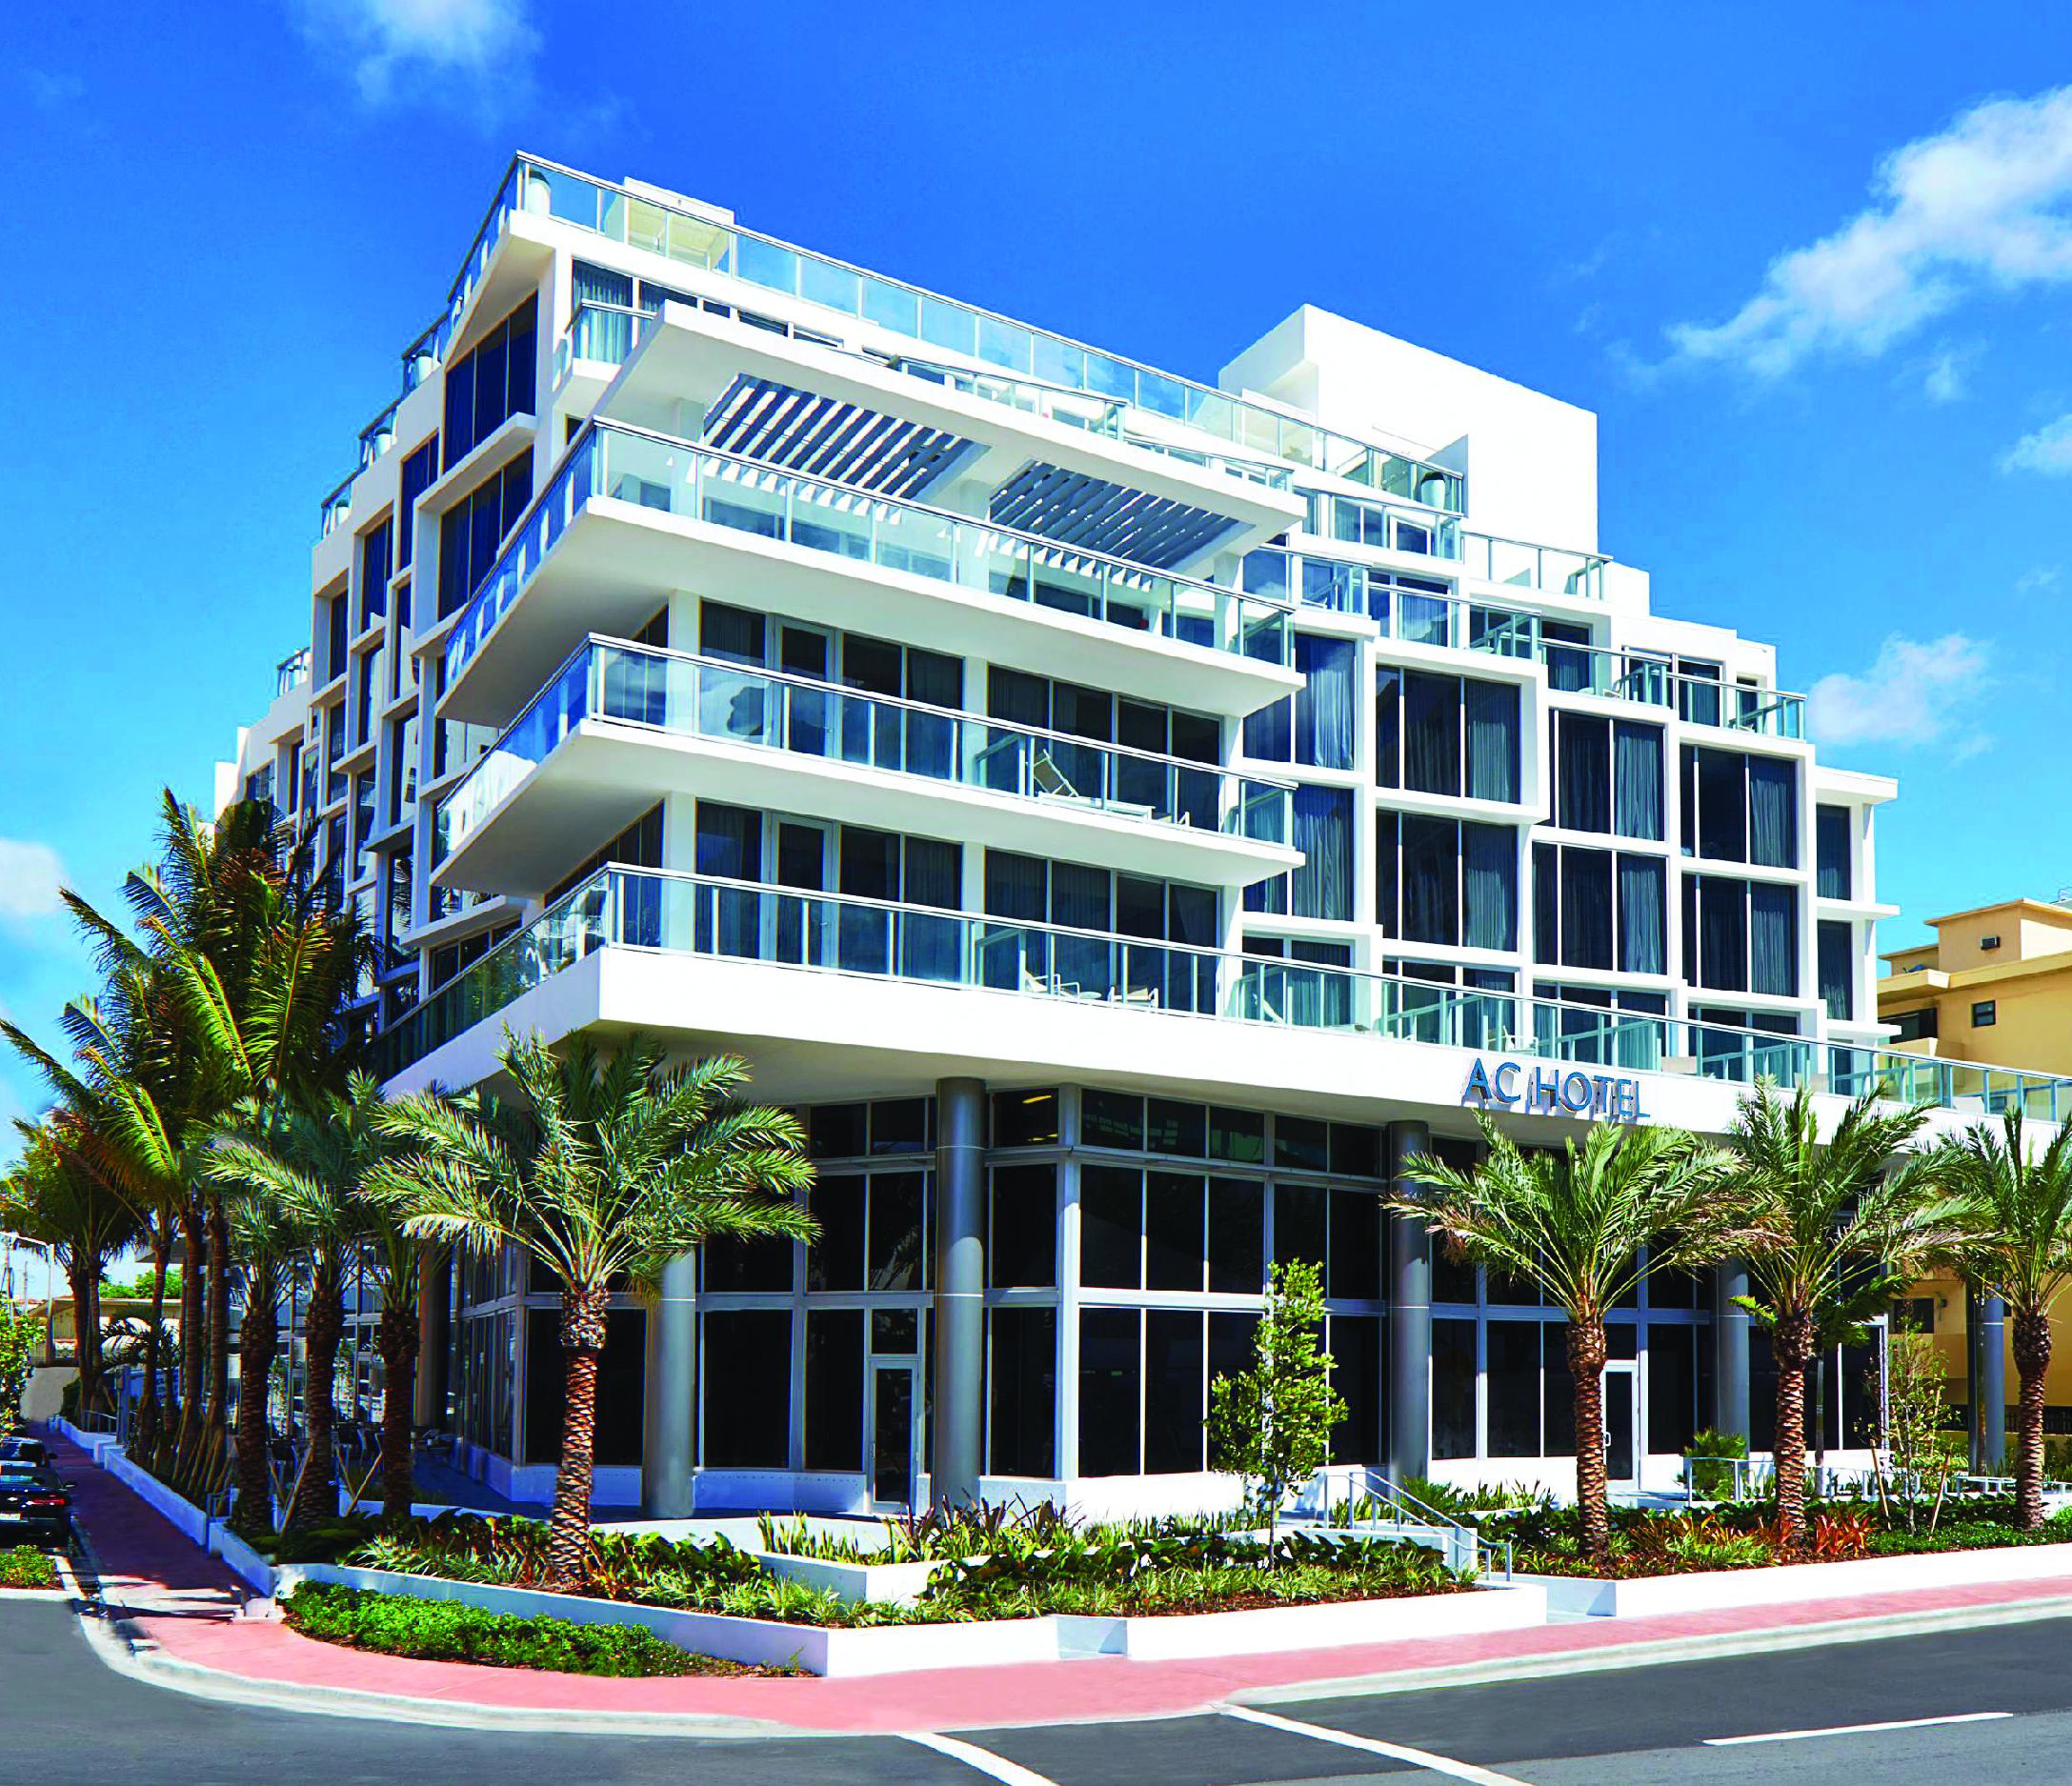 Ac Hotel By Marriott Miami Beach Desimone Consulting